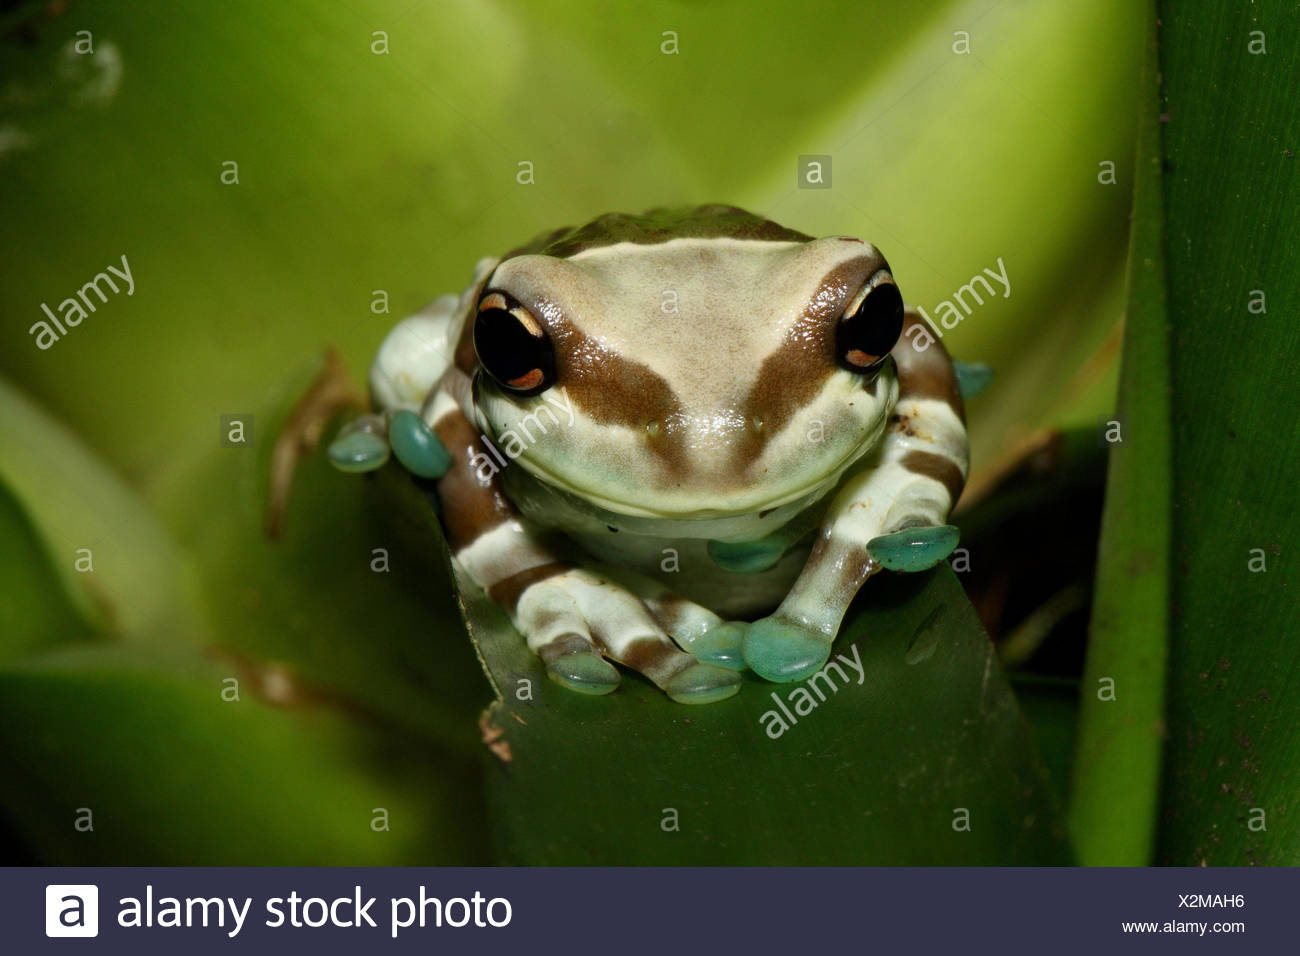 Frosch Kröte Laub, Blätter, Sit, Porträt, Gruben-Kröte Laub Laubfrosch, Frosch, Laub Frosch, Frosch Amphibie, Amphibien, wildes Tier, Tier, Natur, grün, Brasilien, Amazonas, Amazonas, Regenwald, Tier Portrait Stockbild